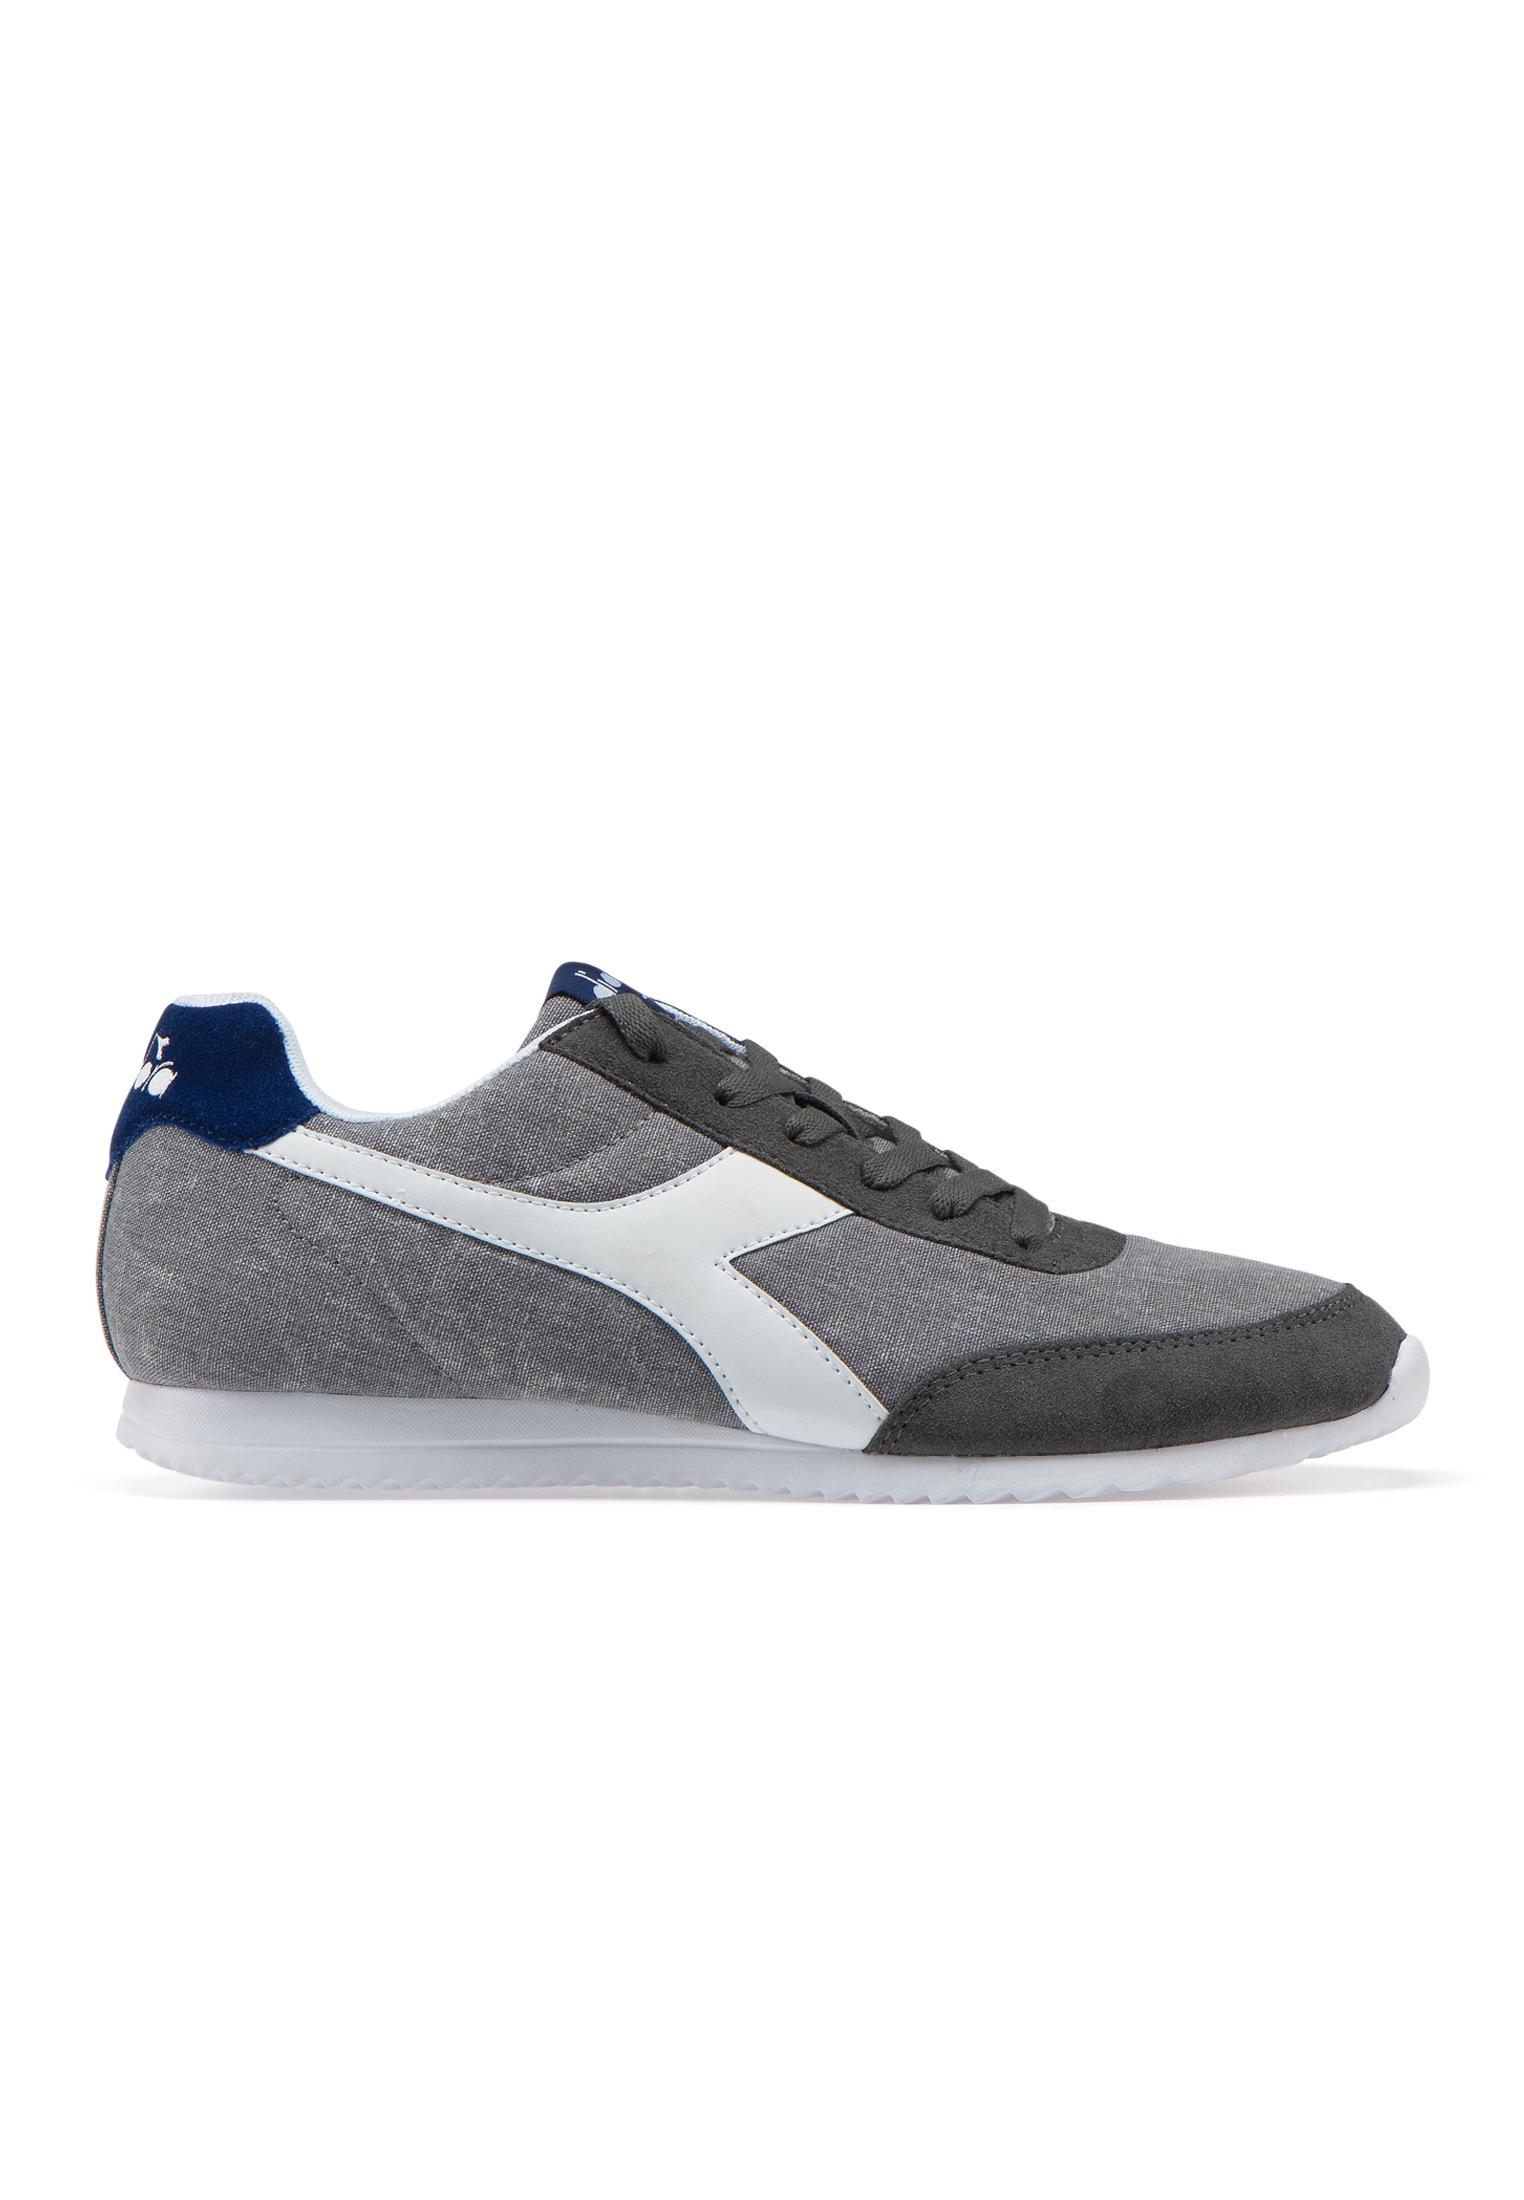 Scarpe-Diadora-Jog-Light-C-Sneakers-sportive-uomo-donna-vari-colori-e-taglie miniatura 75